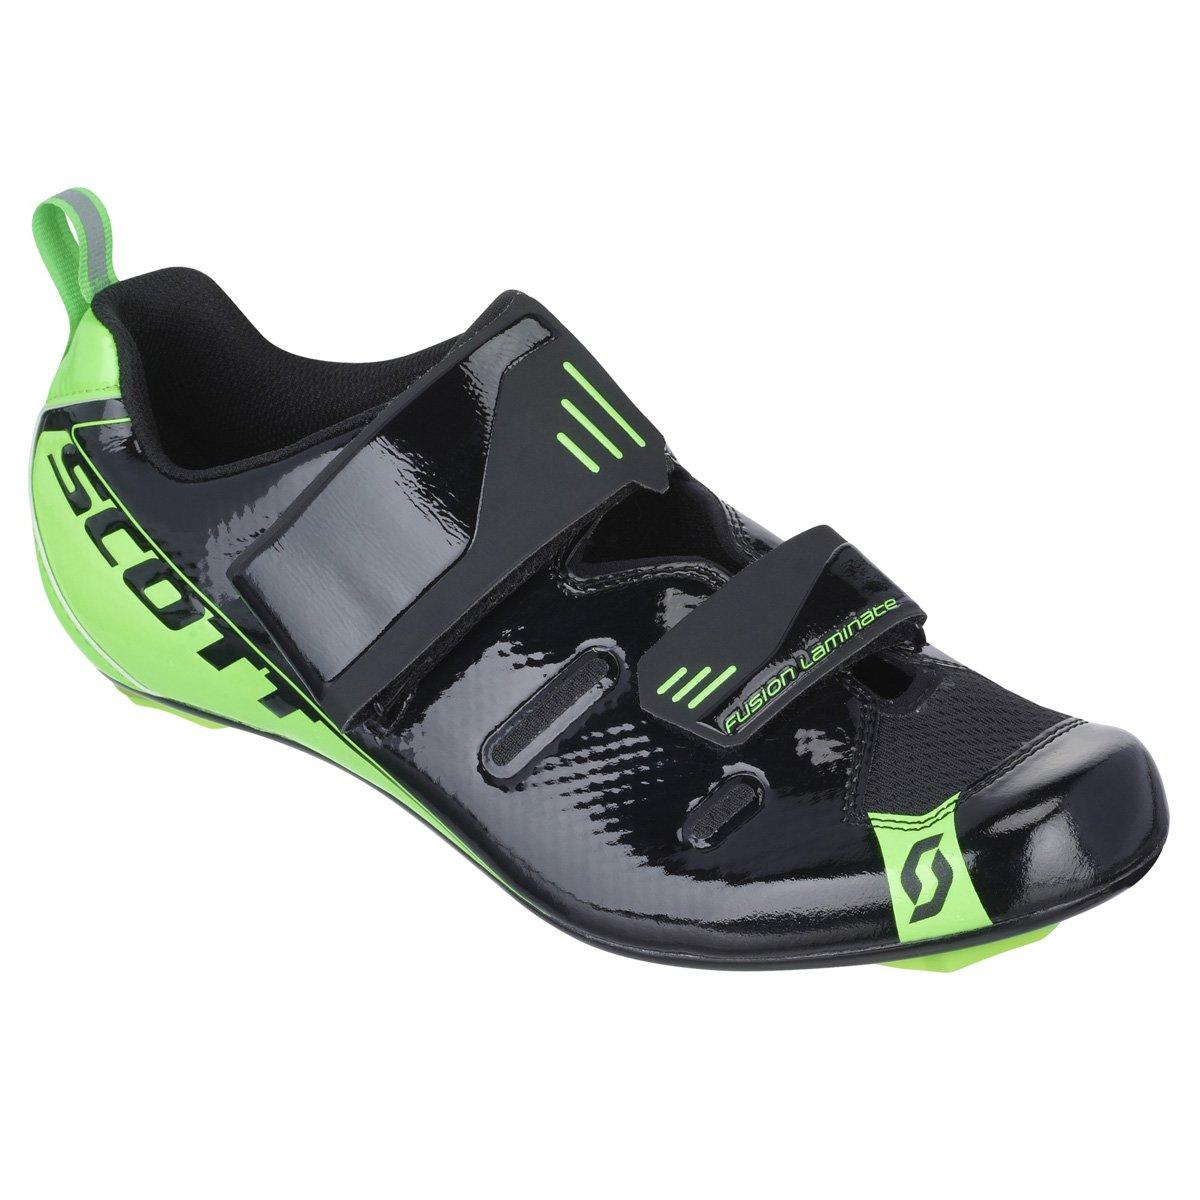 Scott Sports メンズ Scott US サイズ: 48 EU カラー: ブラック   B01BM4ENEQ